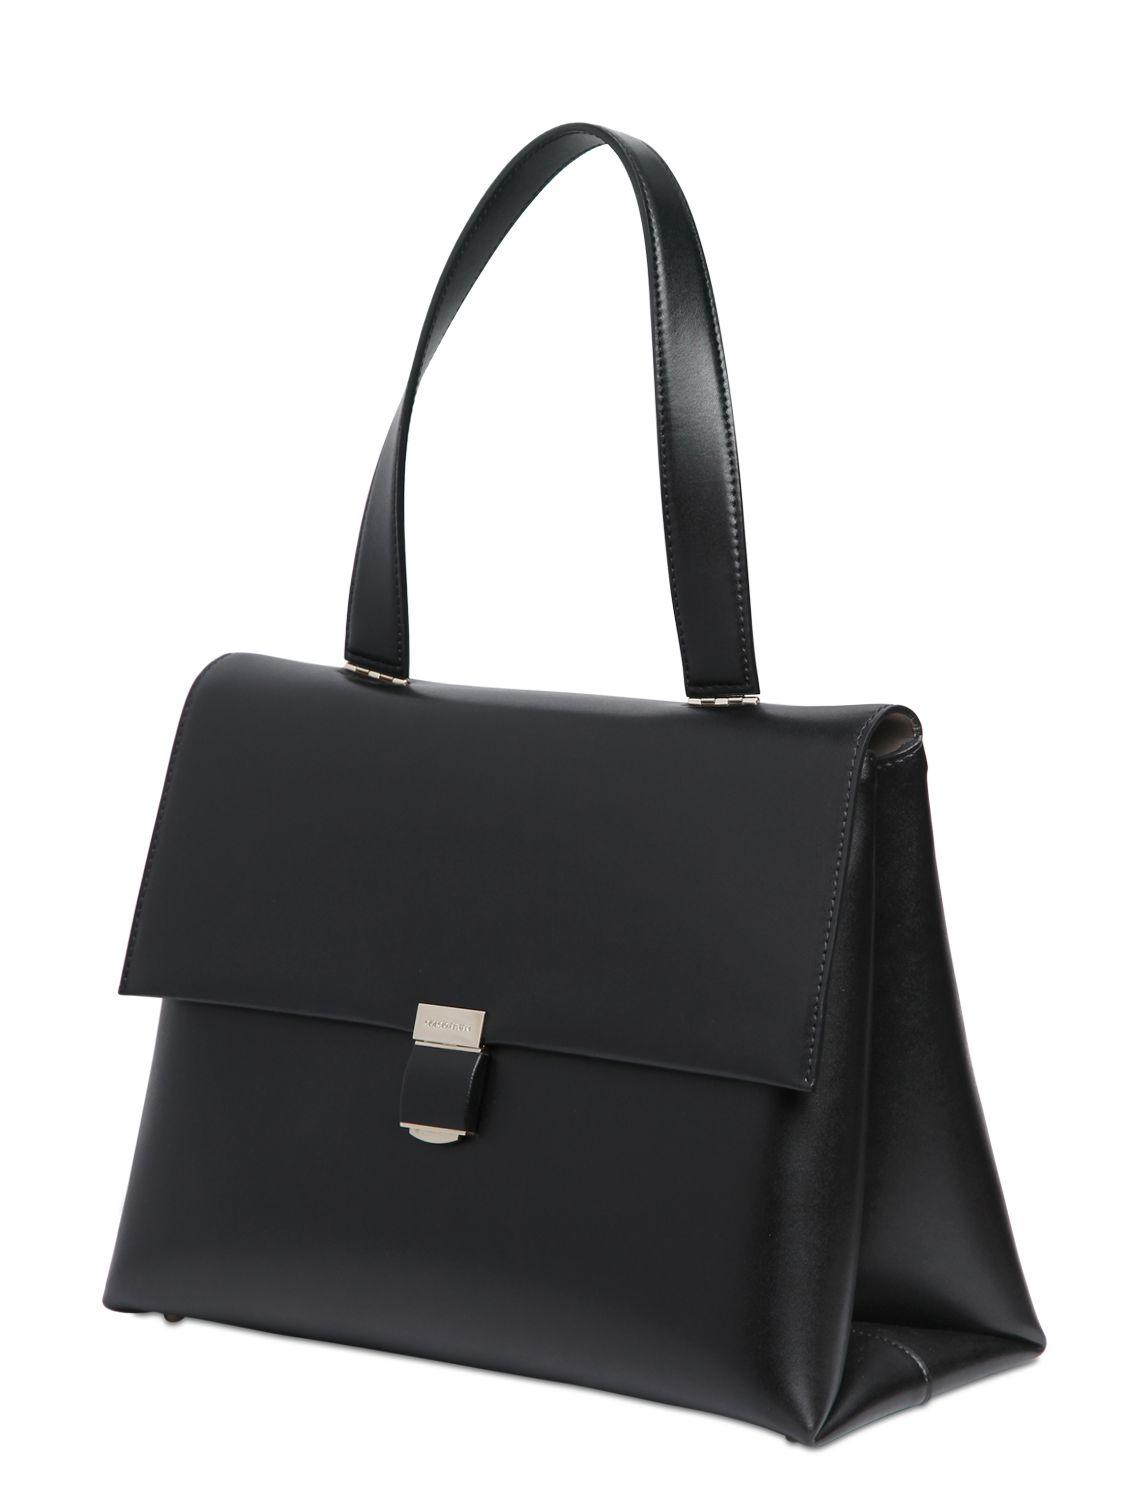 Lyst - Giorgio Armani Charniere Doree  Leather Top Handle Bag in Black d3dbd1bdd8